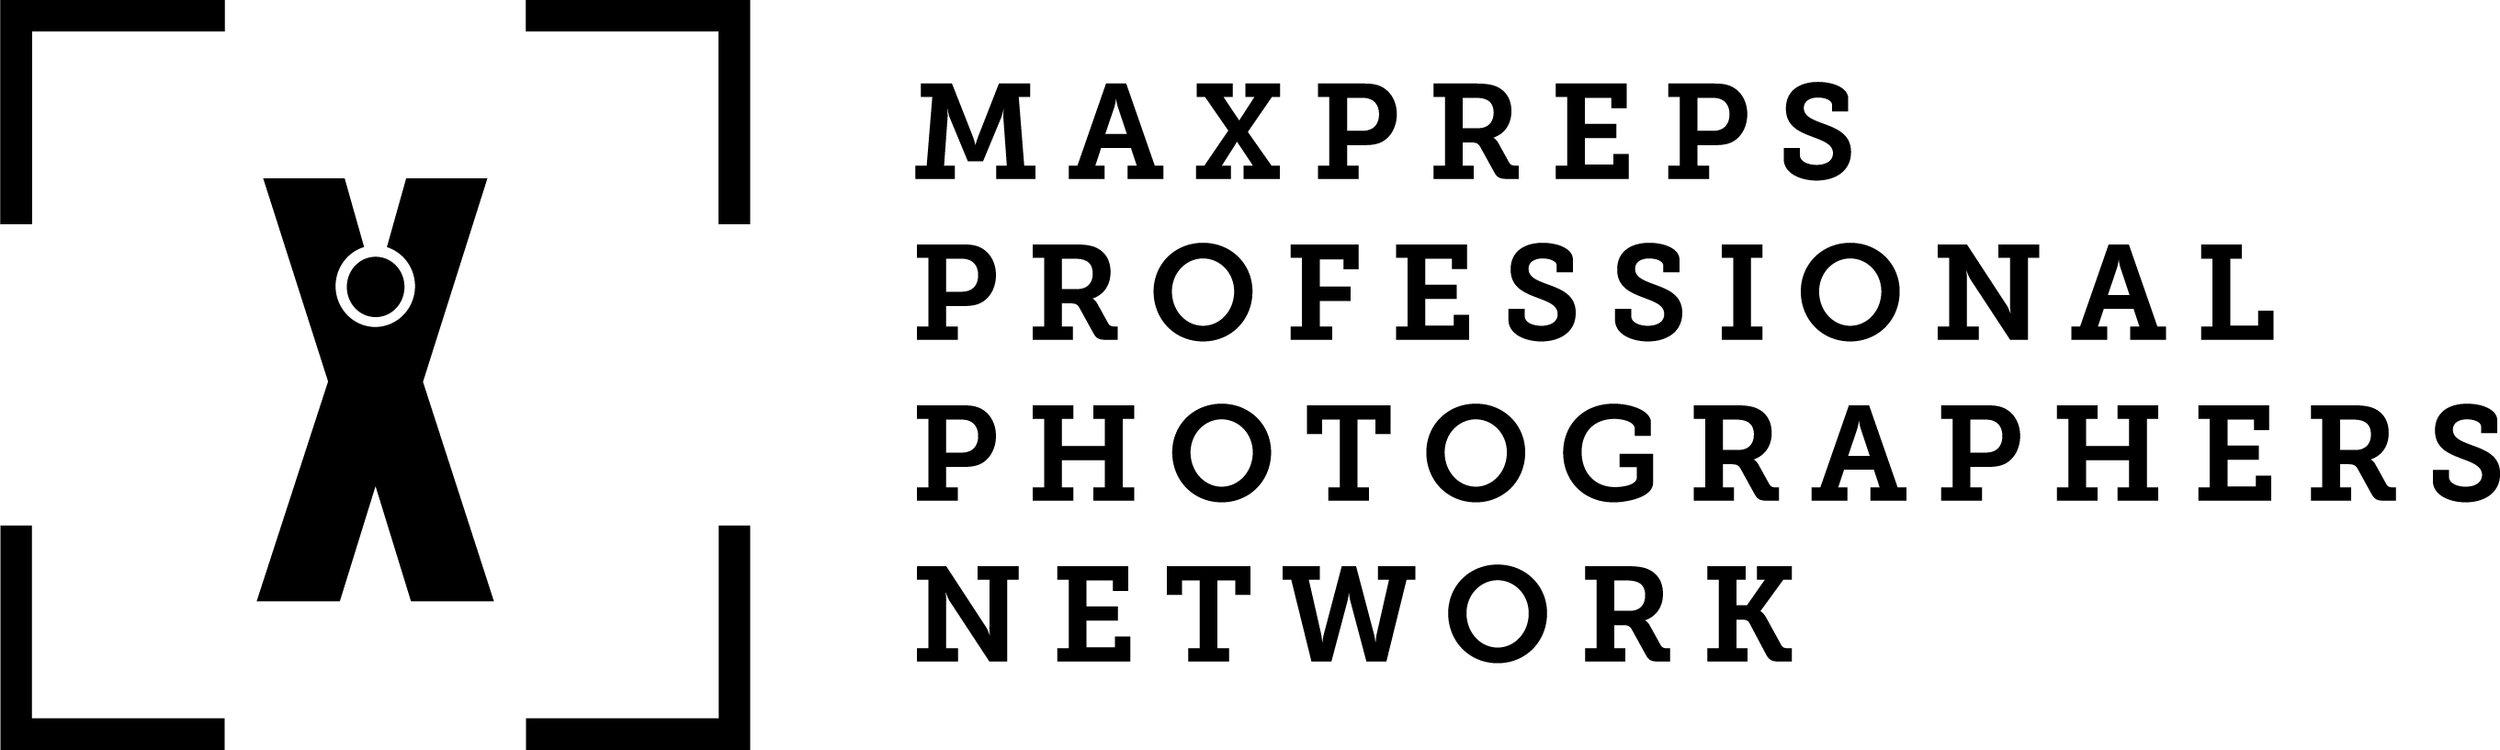 mppn-logo-black@4x copy.jpg